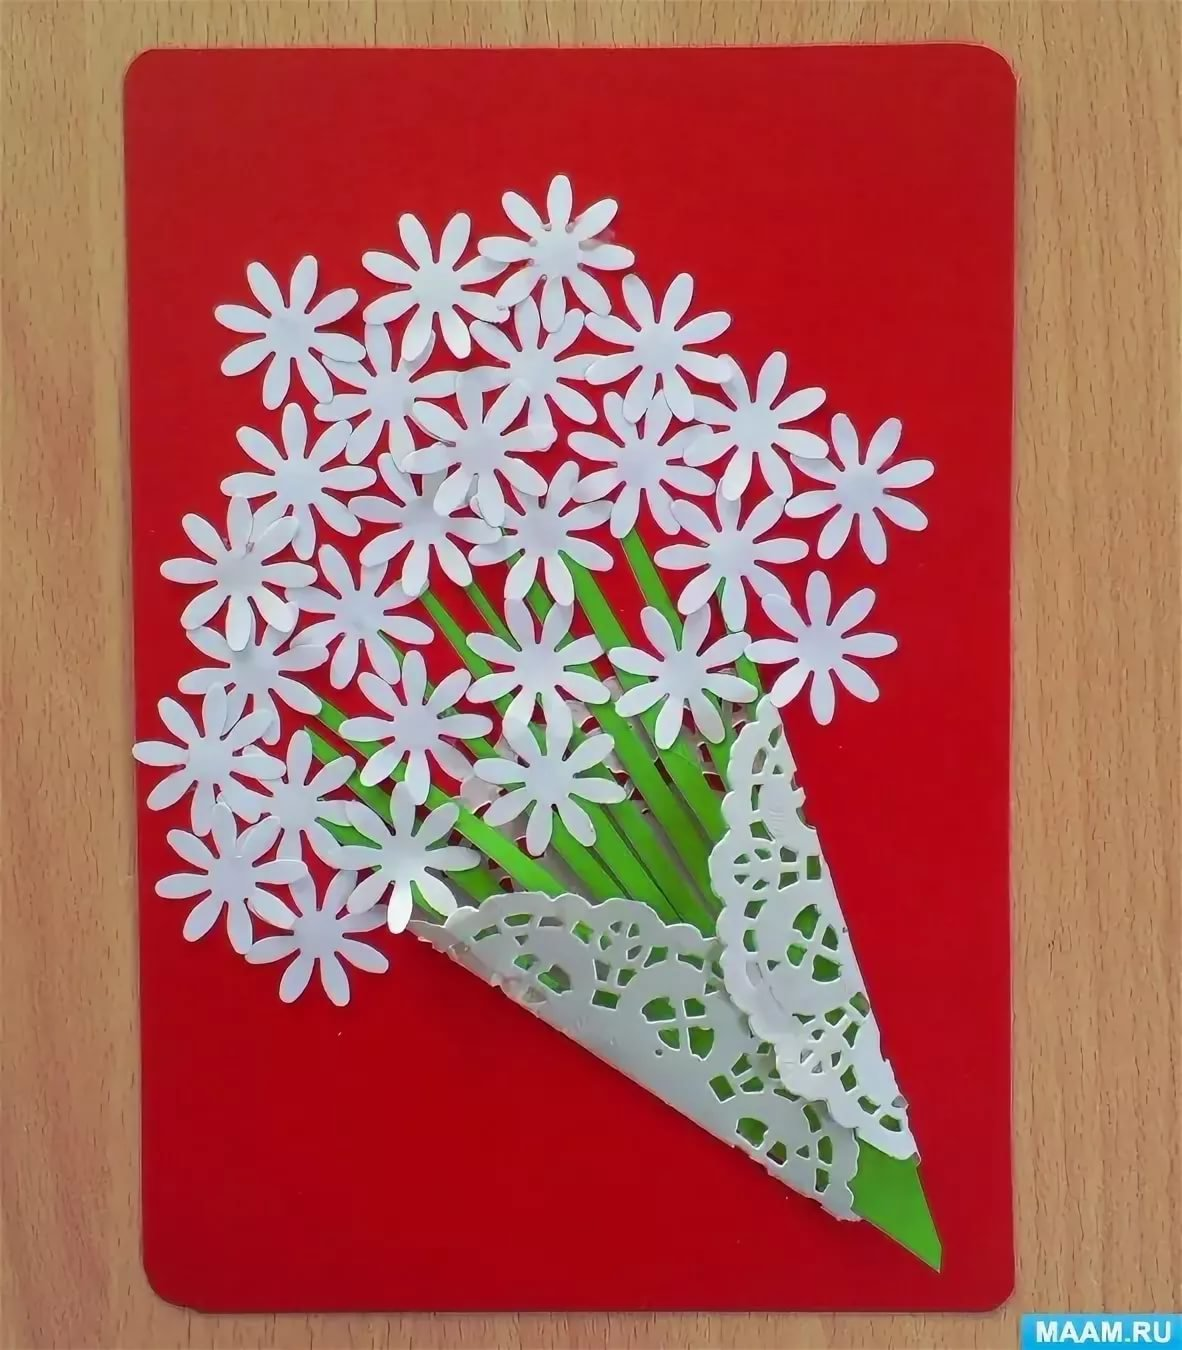 Картинках, открытки с днем матери 4 класс